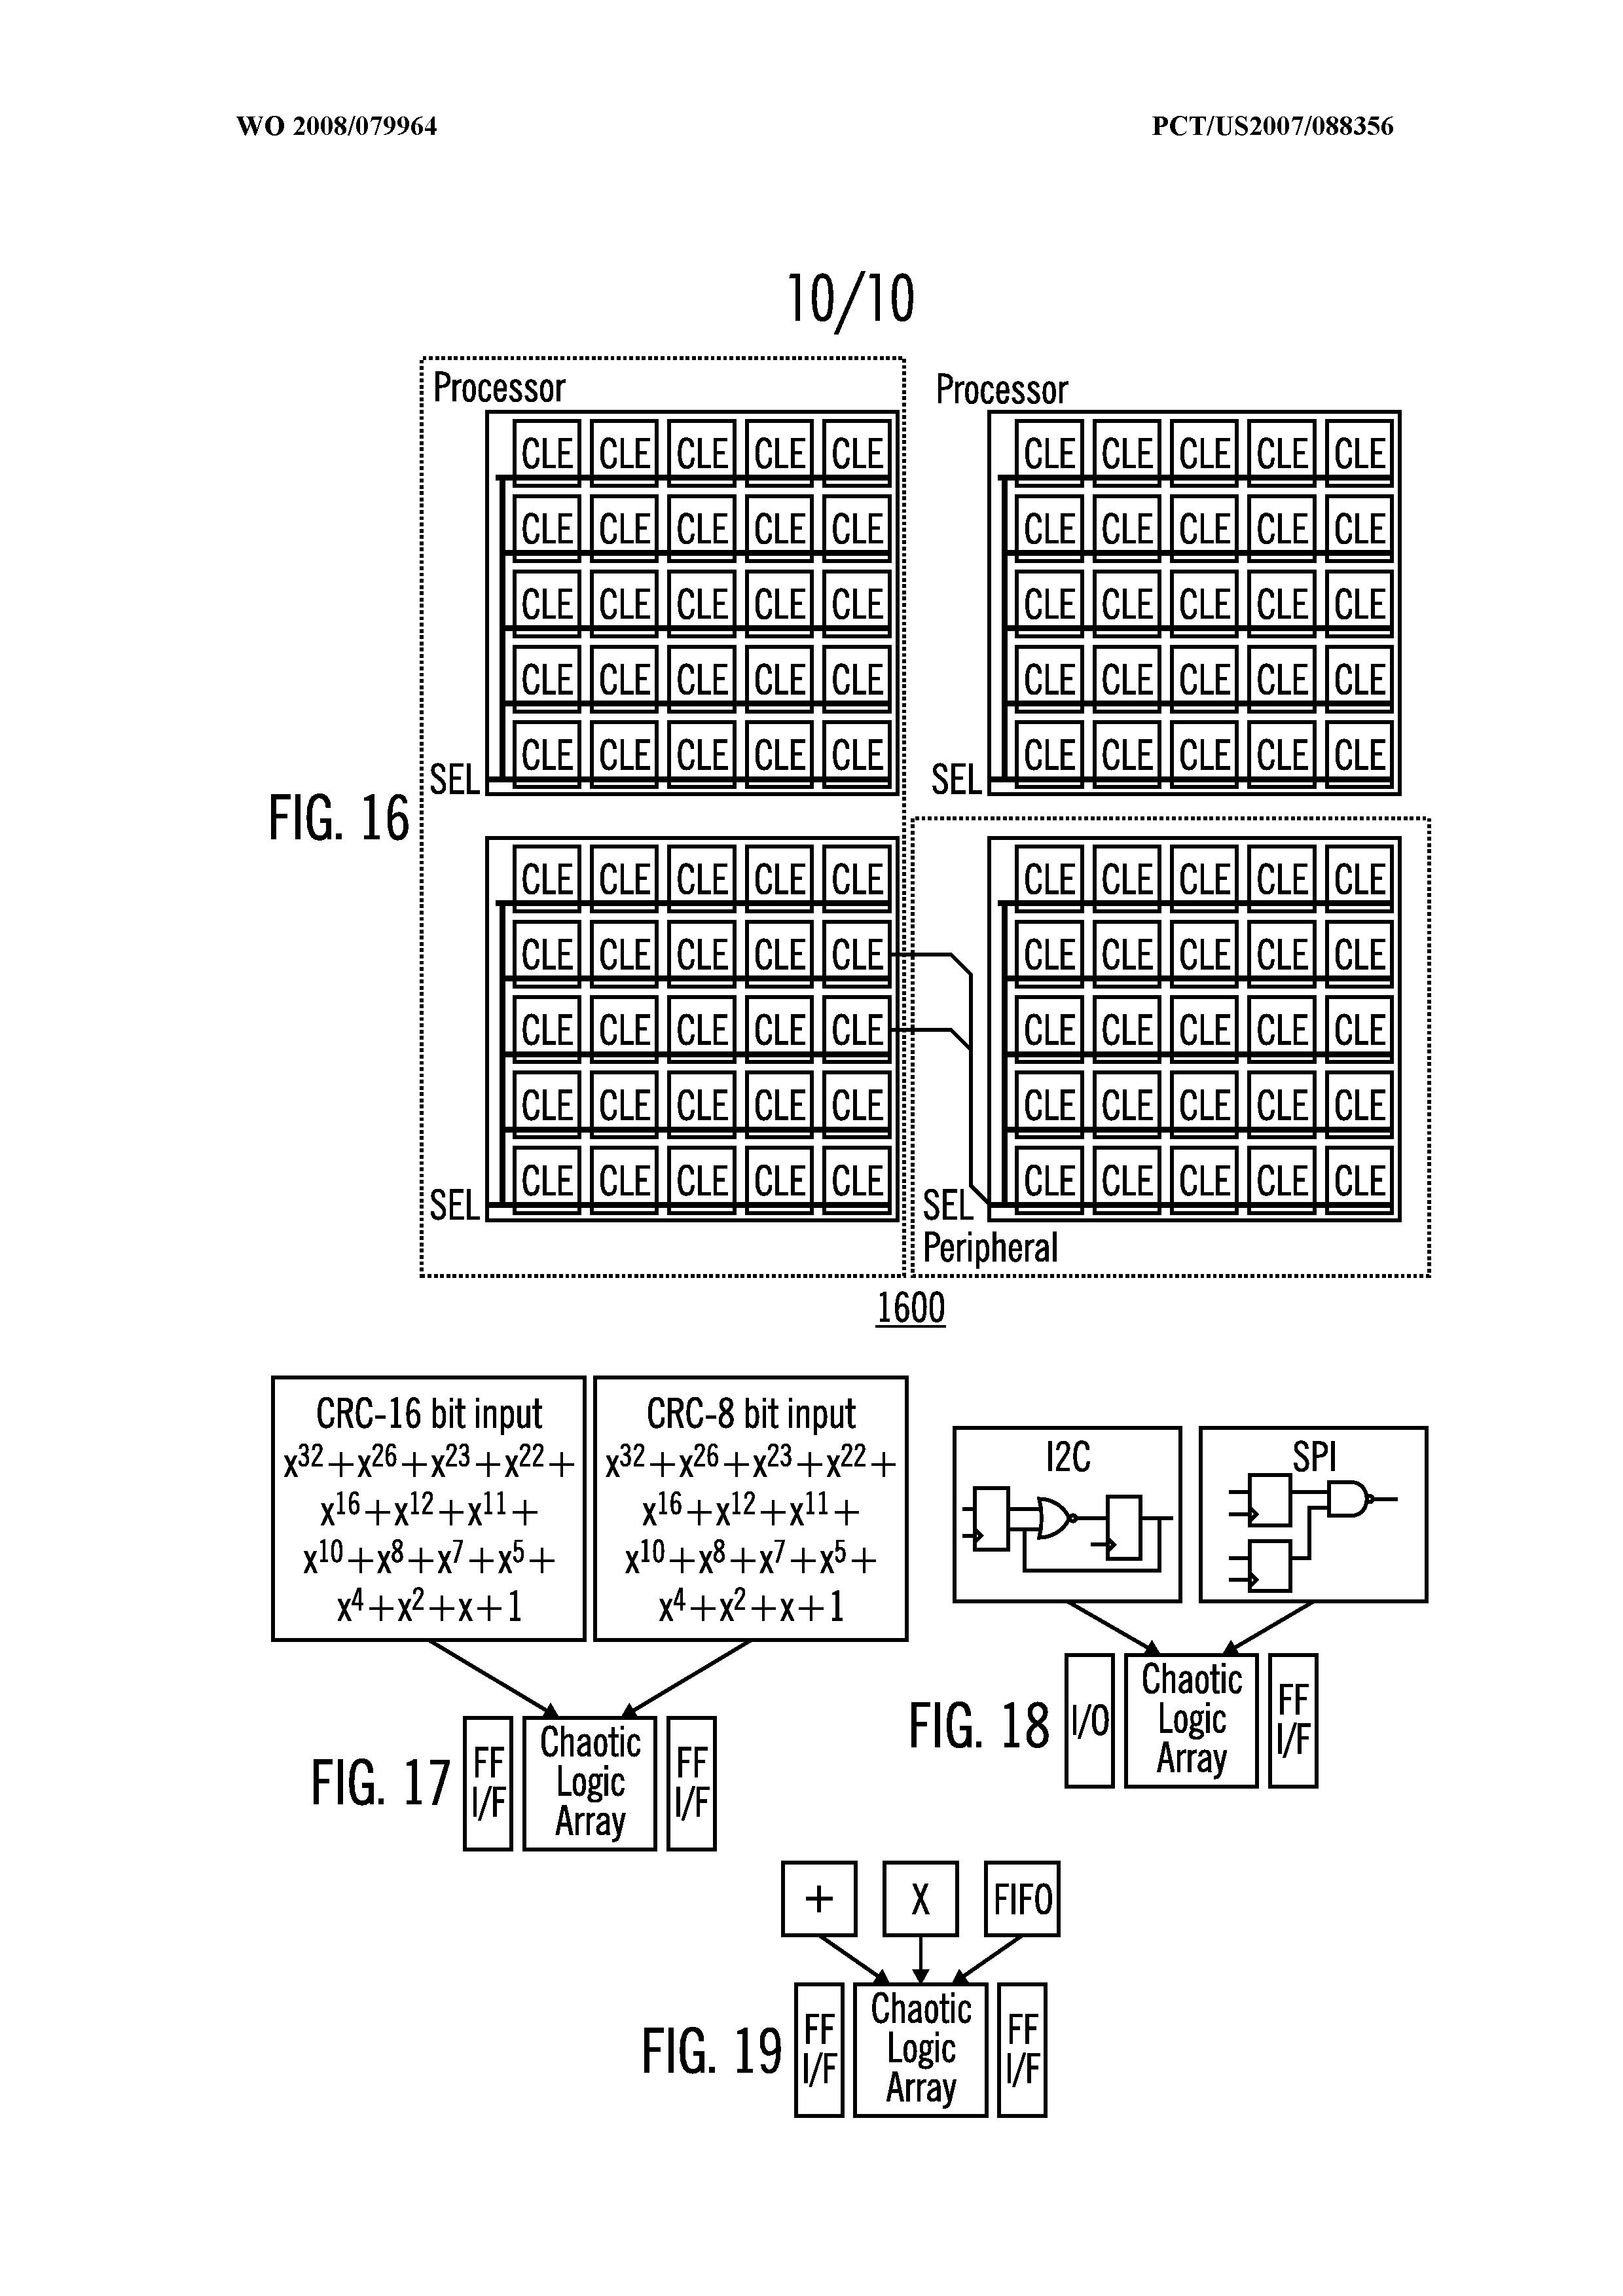 WO 2008/079964 A1 - Dynamically Configurable Logic Gate Using A